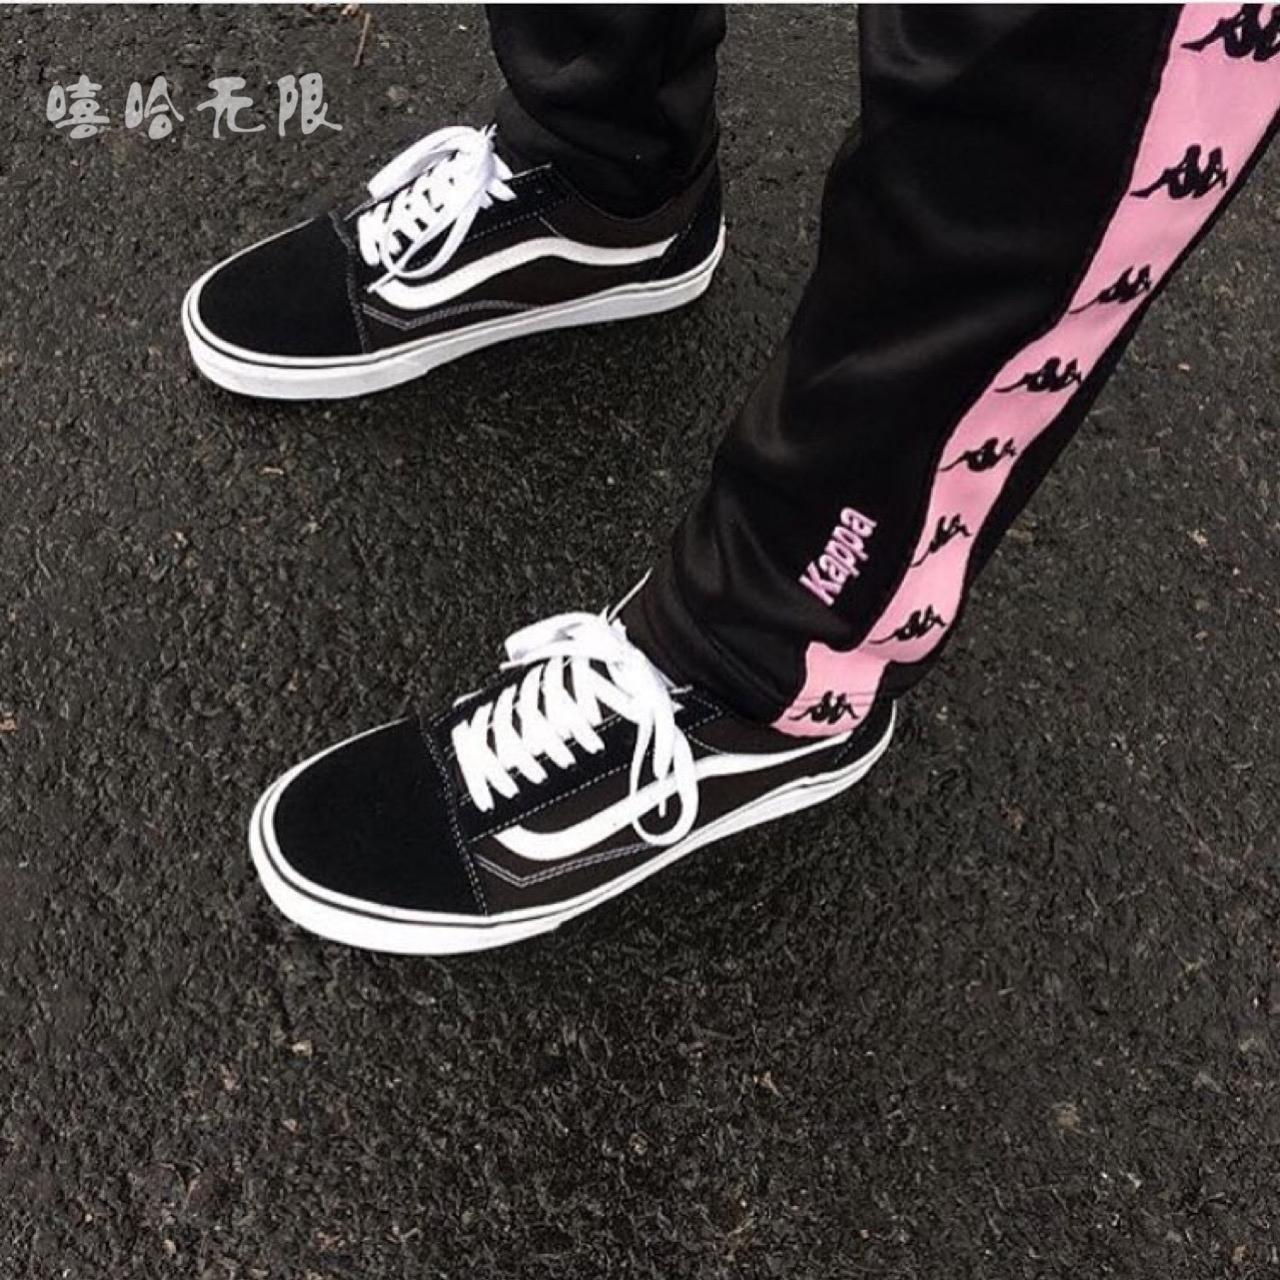 VANS高帮SK8-HI低帮OS黑色经典款帆布鞋男女鞋VN-0D3HY28